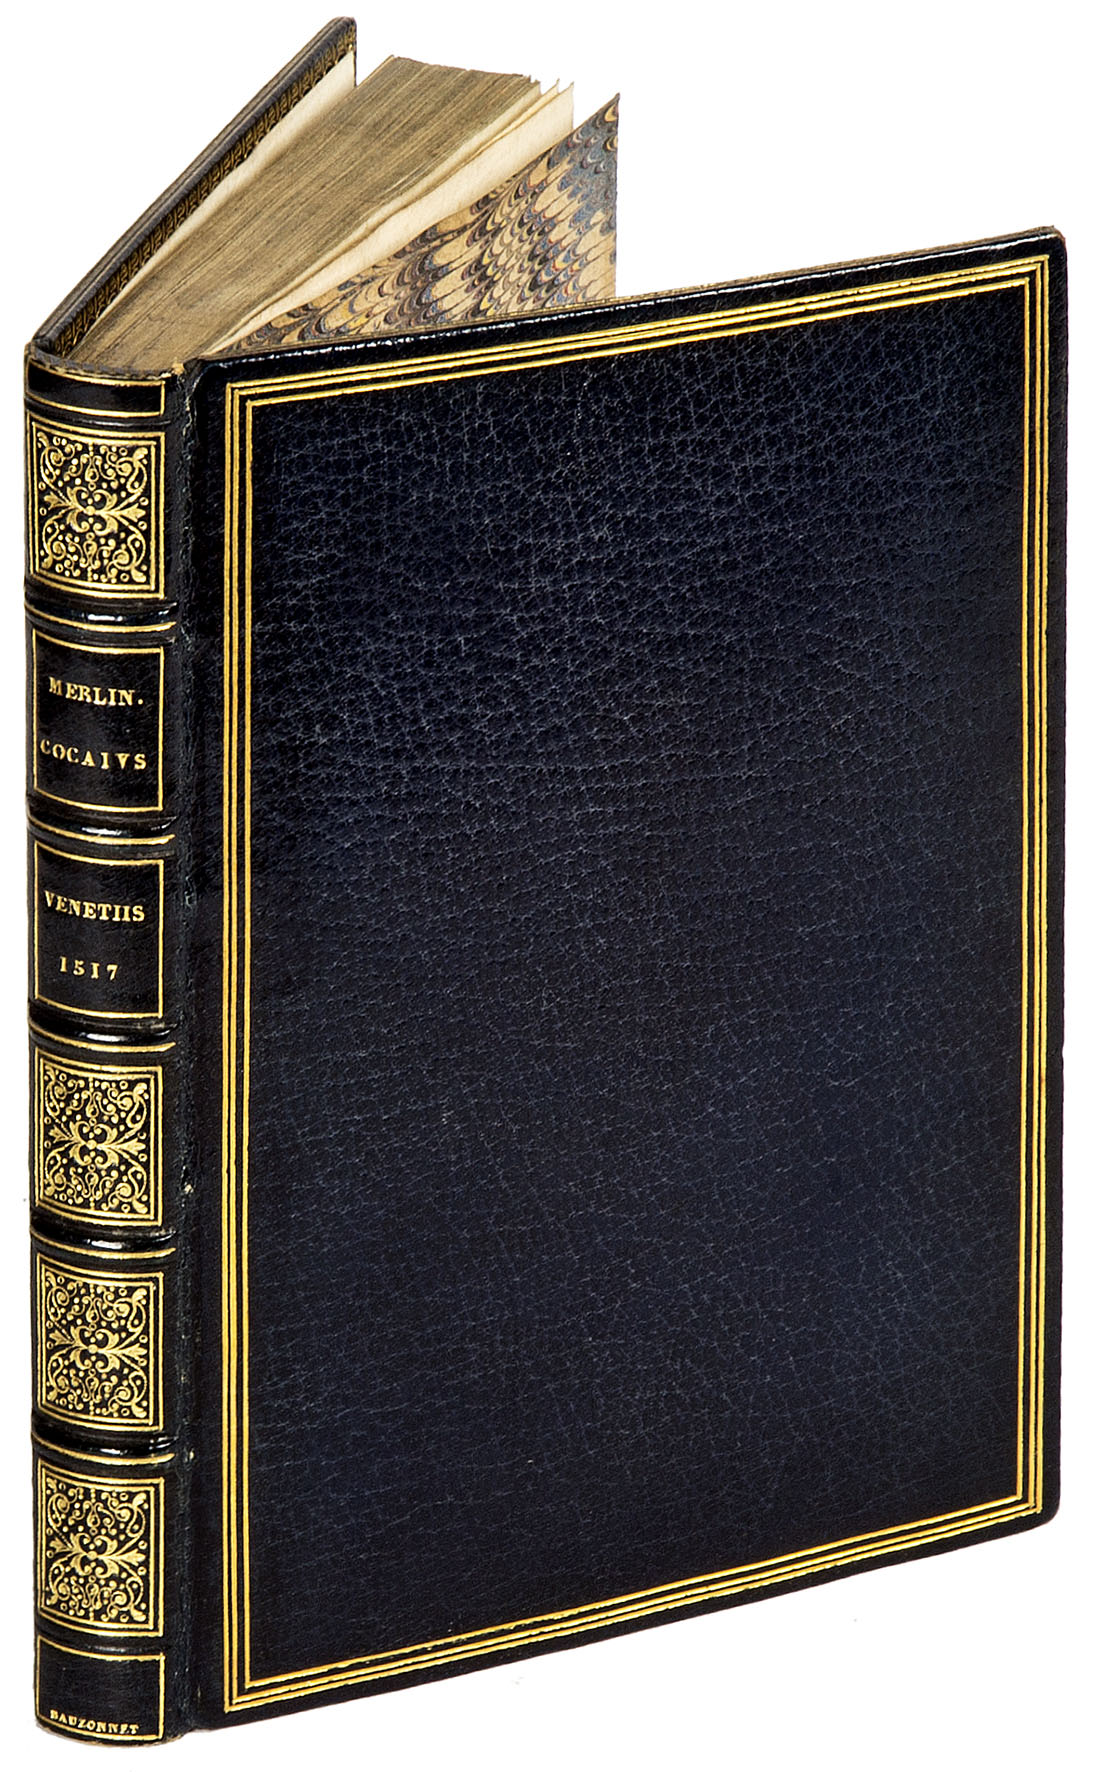 10 Folengo 1517.jpg